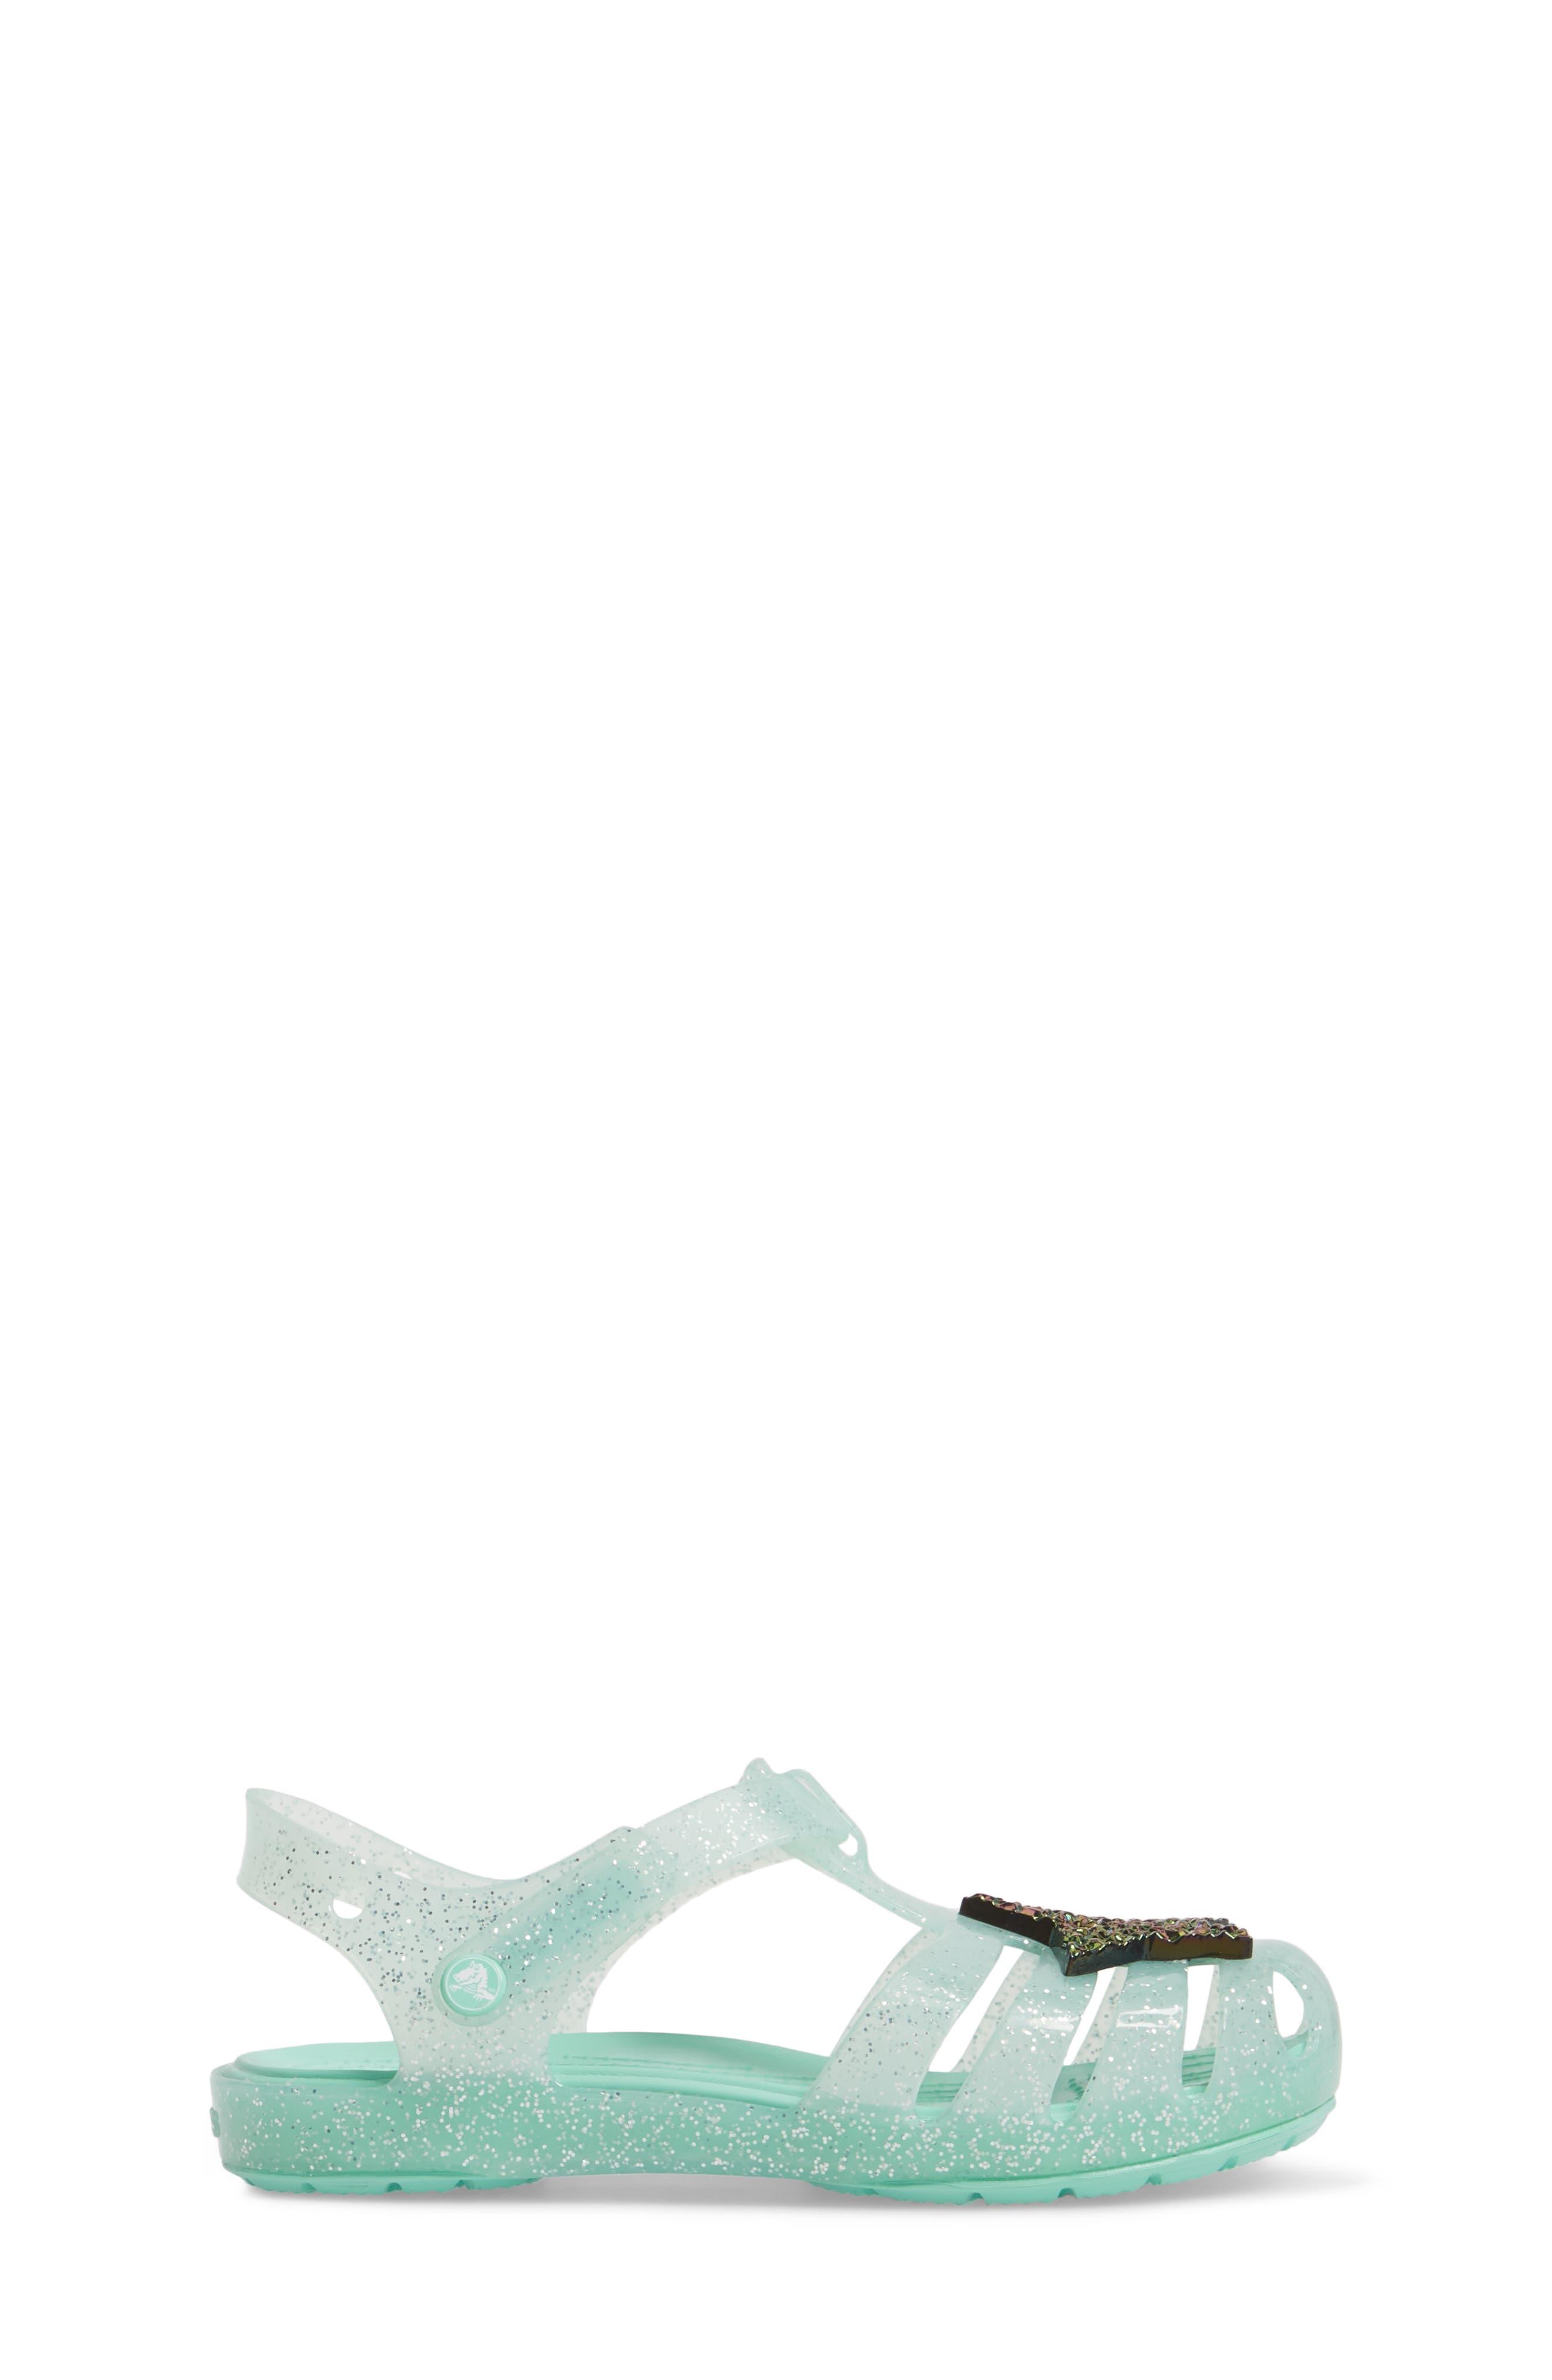 Isabella Glitter Fisherman Sandal,                             Alternate thumbnail 3, color,                             Mint